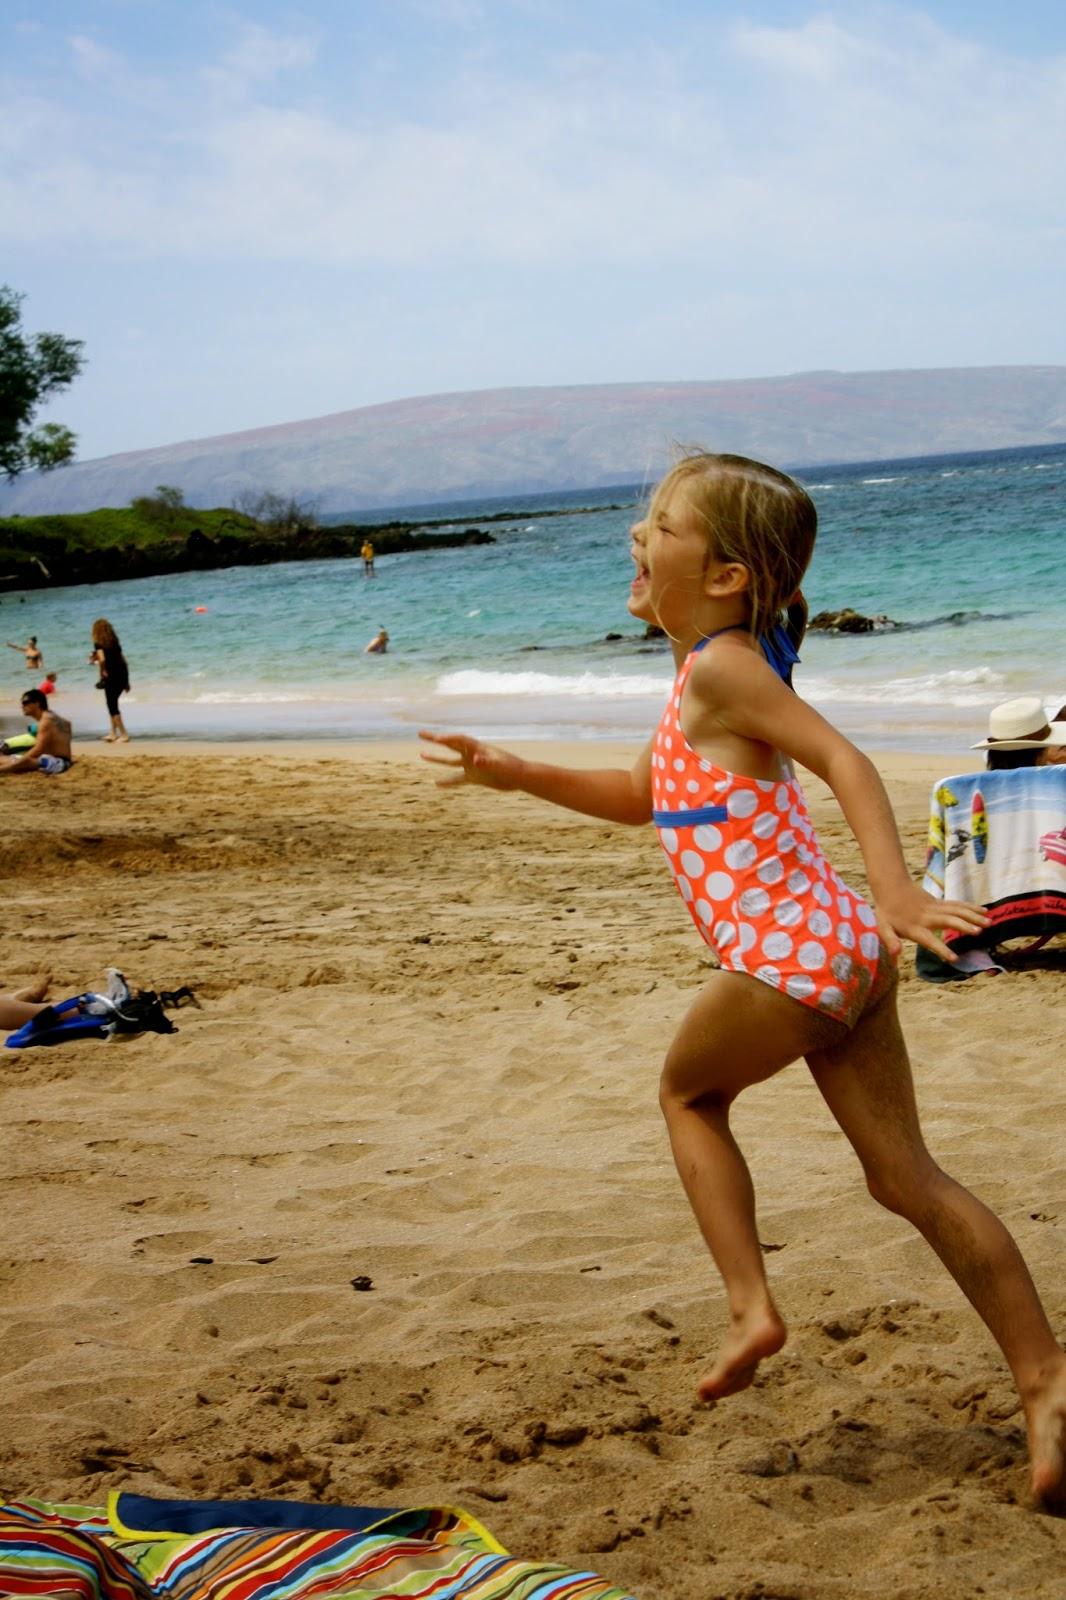 Sierra's View: Beach Life II // Things To Do // Maui